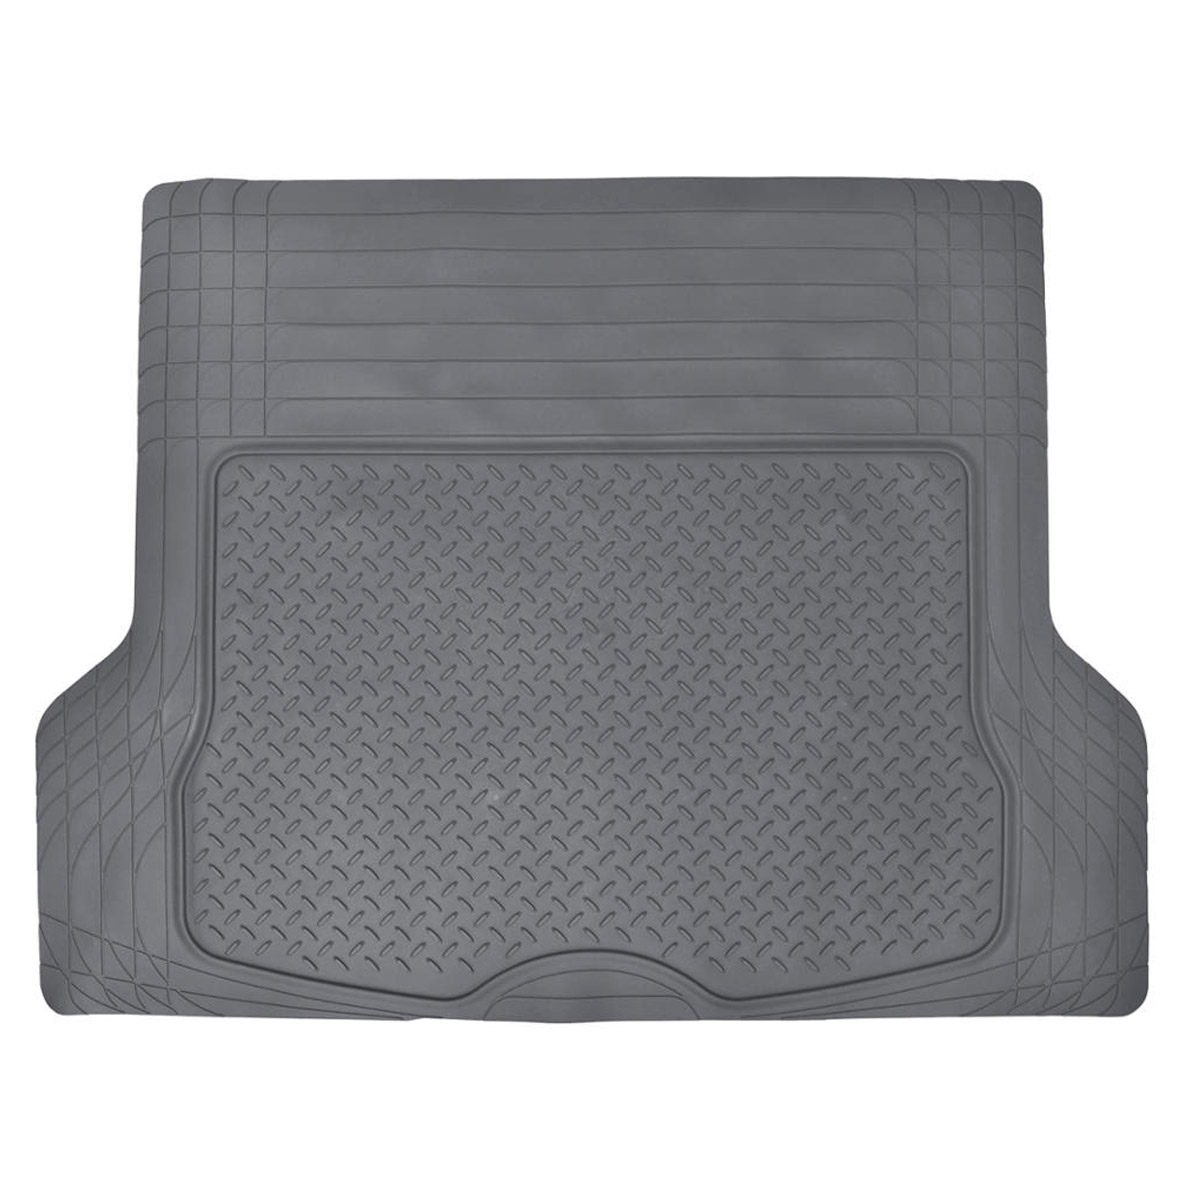 Rubber floor mats suv - Rubber Floor Mat For Car Suv Hd All